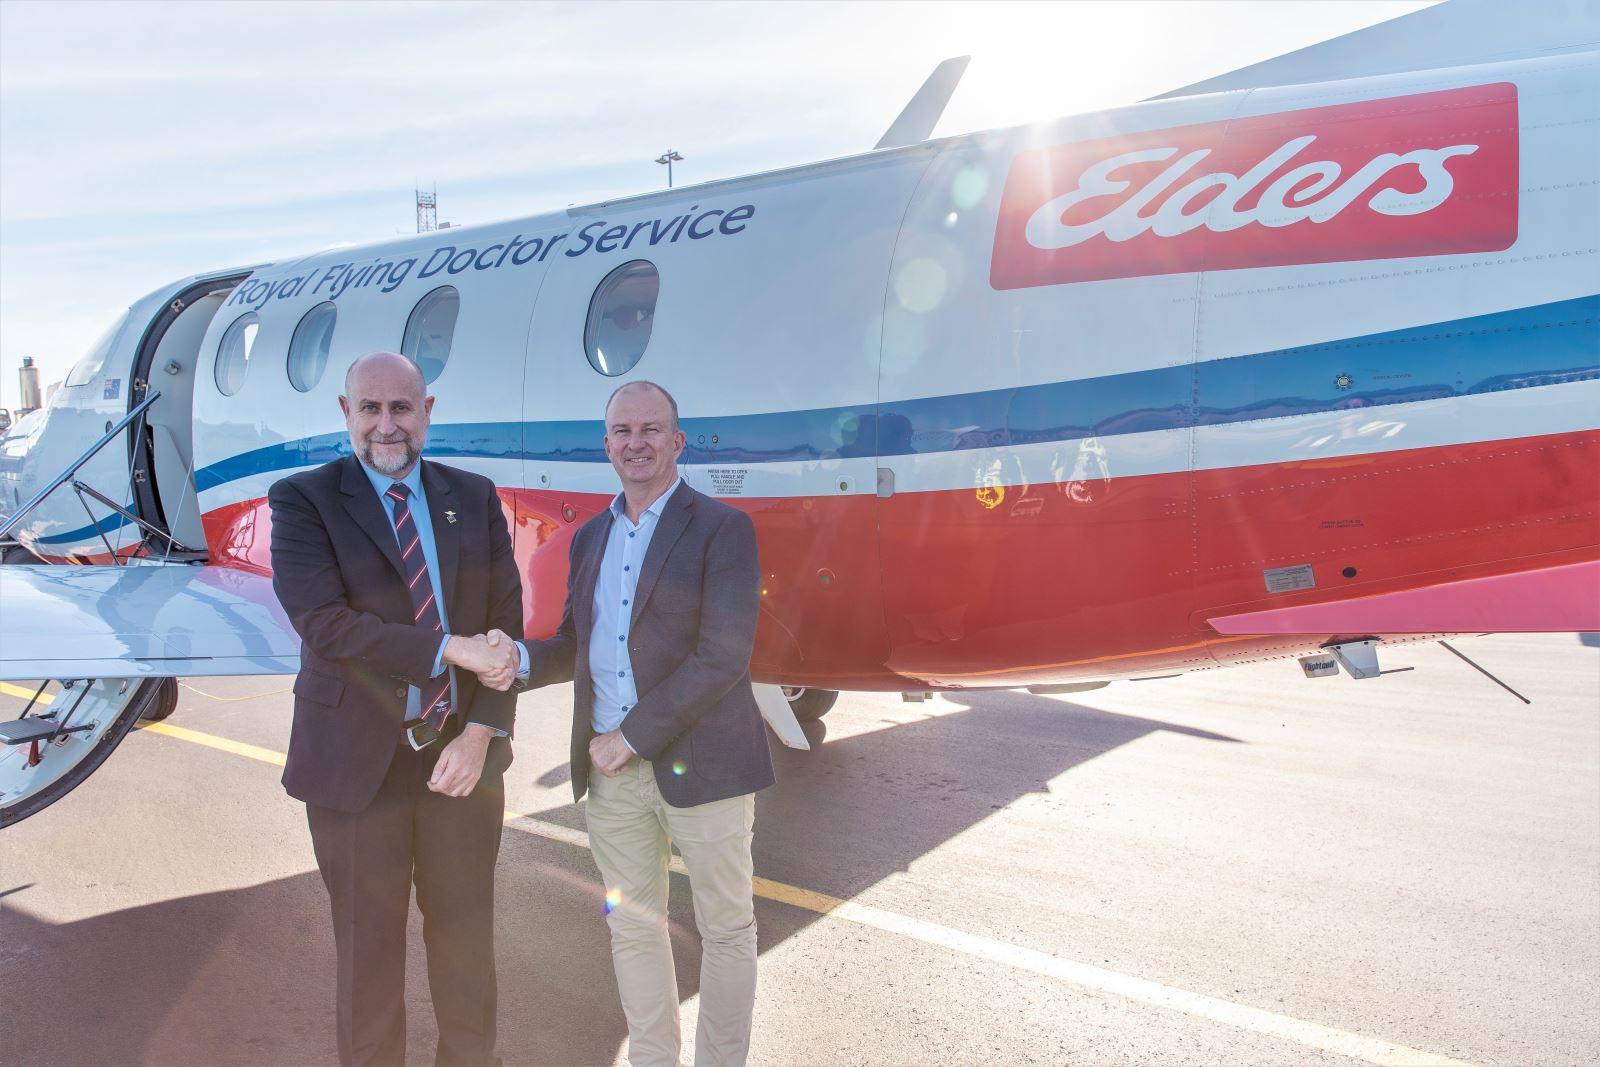 Elders Insurance supports flying doctors